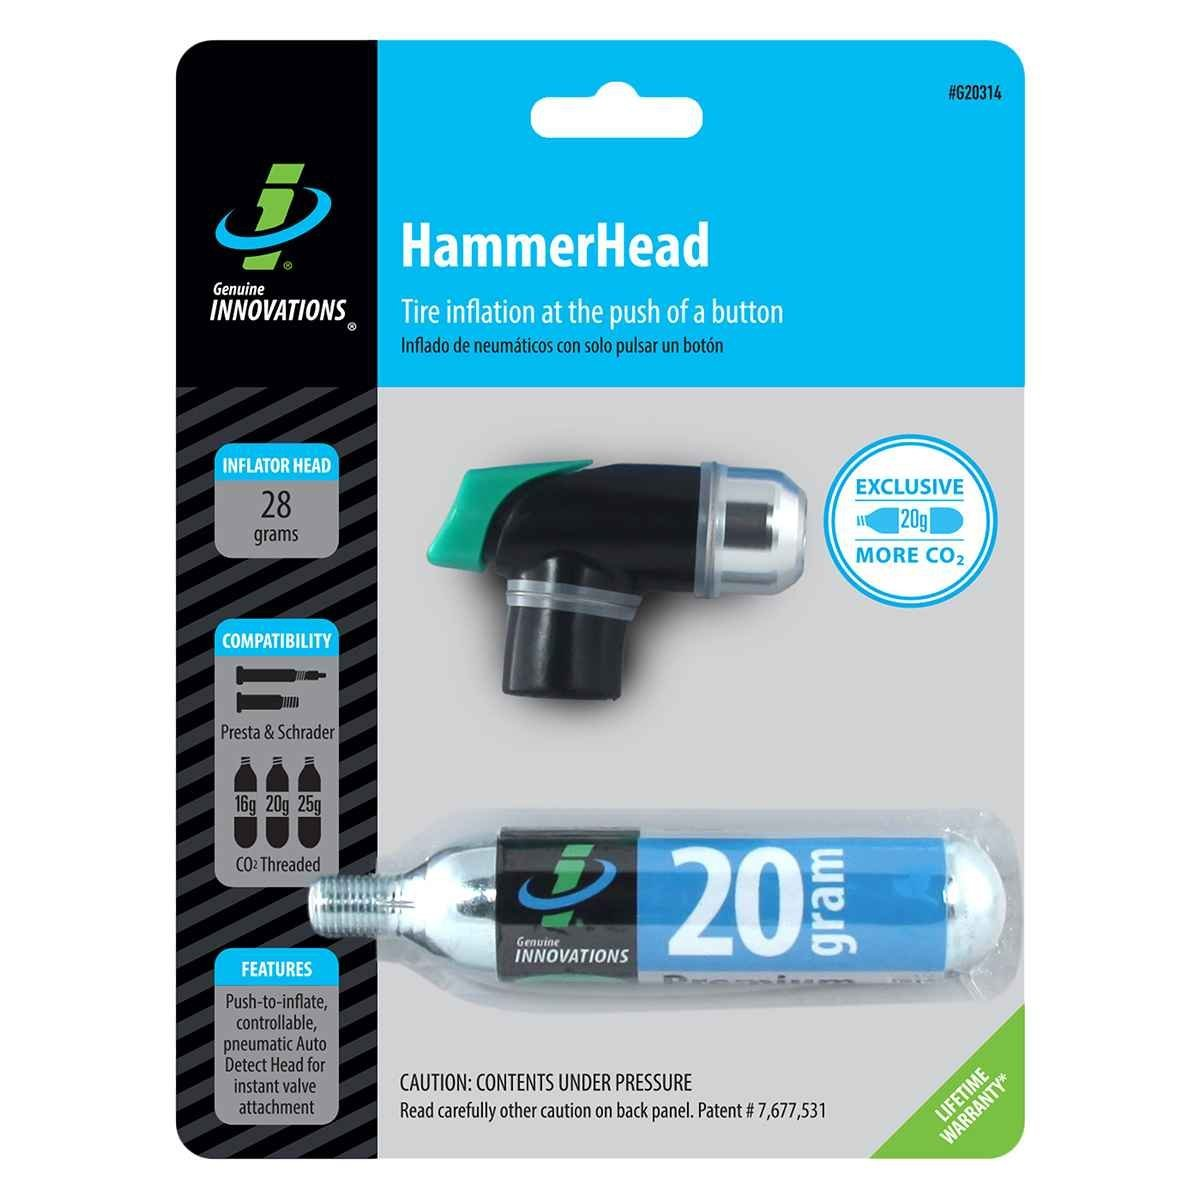 Hammerhead Pump Co2 Push Button Miniw/20g Cartridge, Includes (1) 20 gram threaded CO2 cartridge By Genuine Innovations